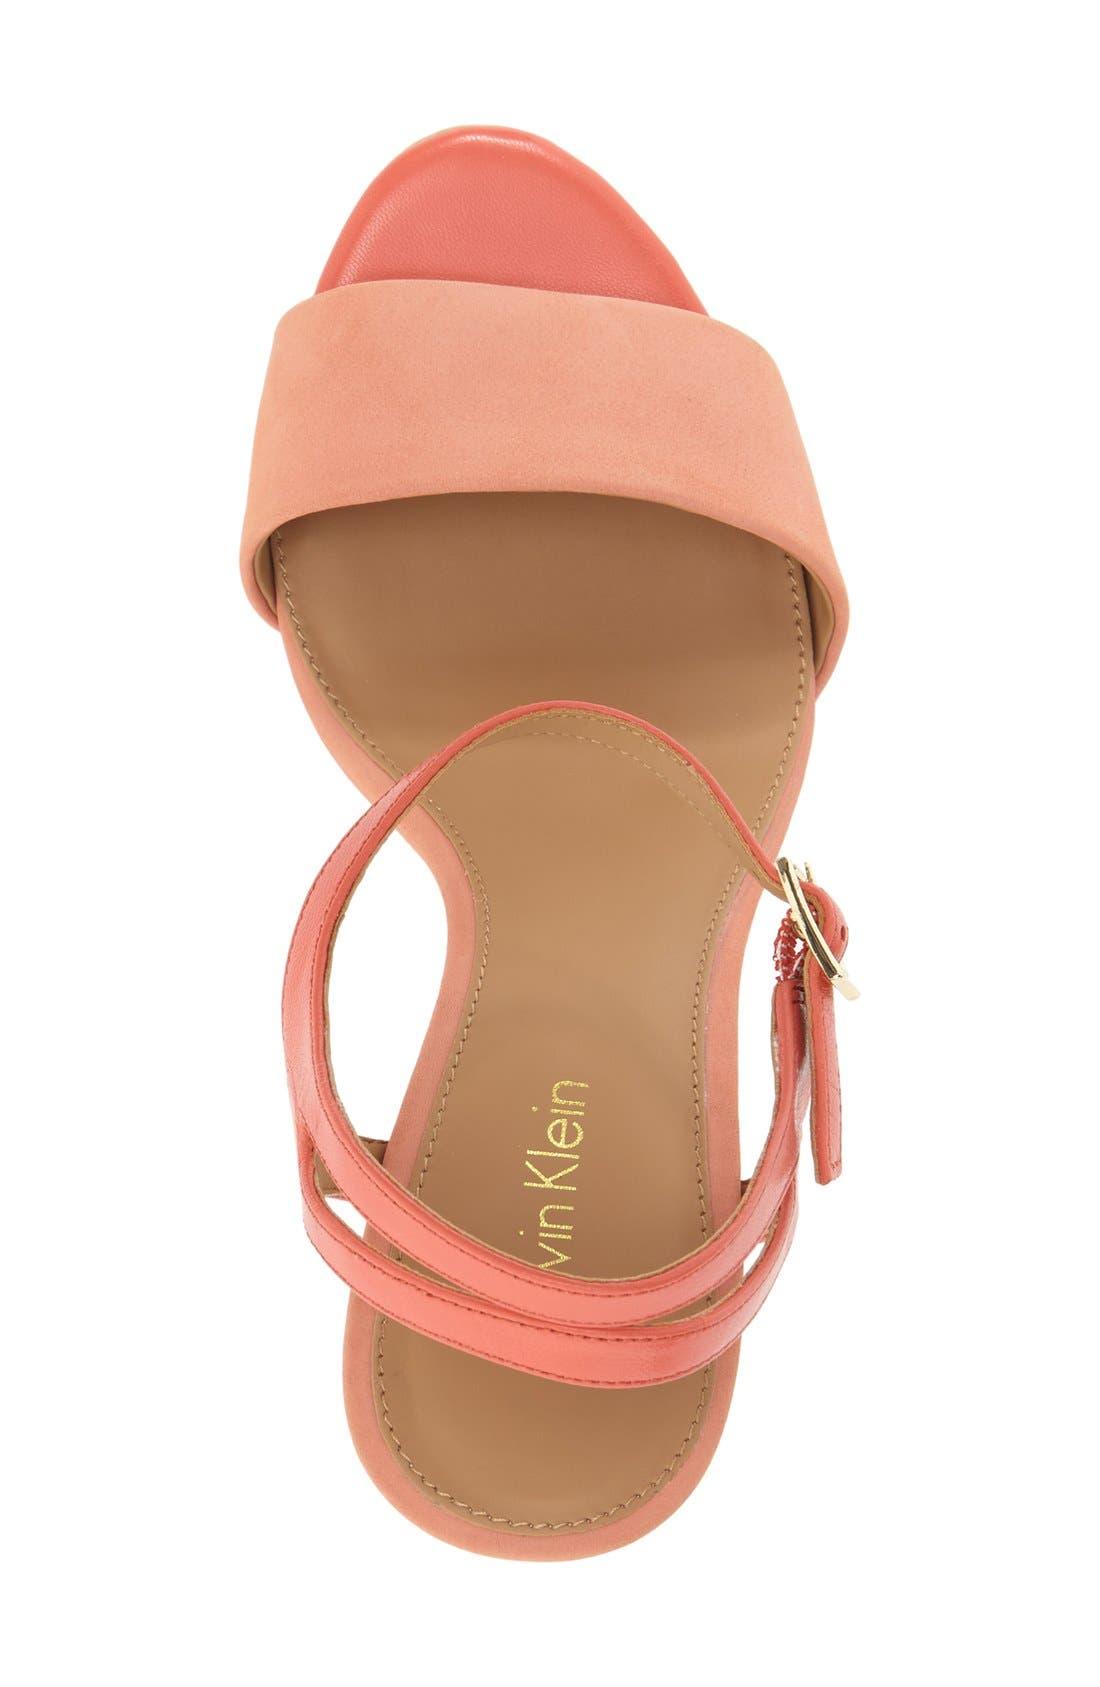 'Nadina' Ankle Strap Sandal,                             Alternate thumbnail 3, color,                             Salmon/ Deep Coral Leather